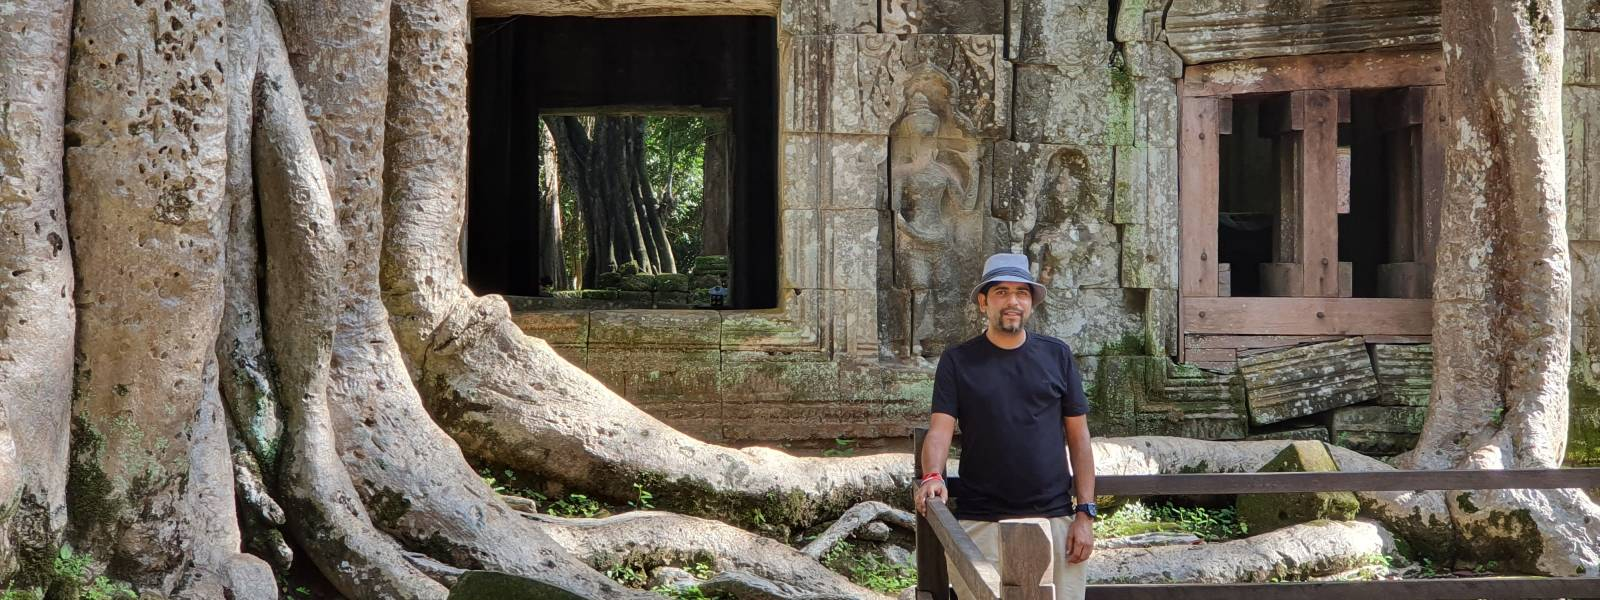 Cambodia - Jas Bhela